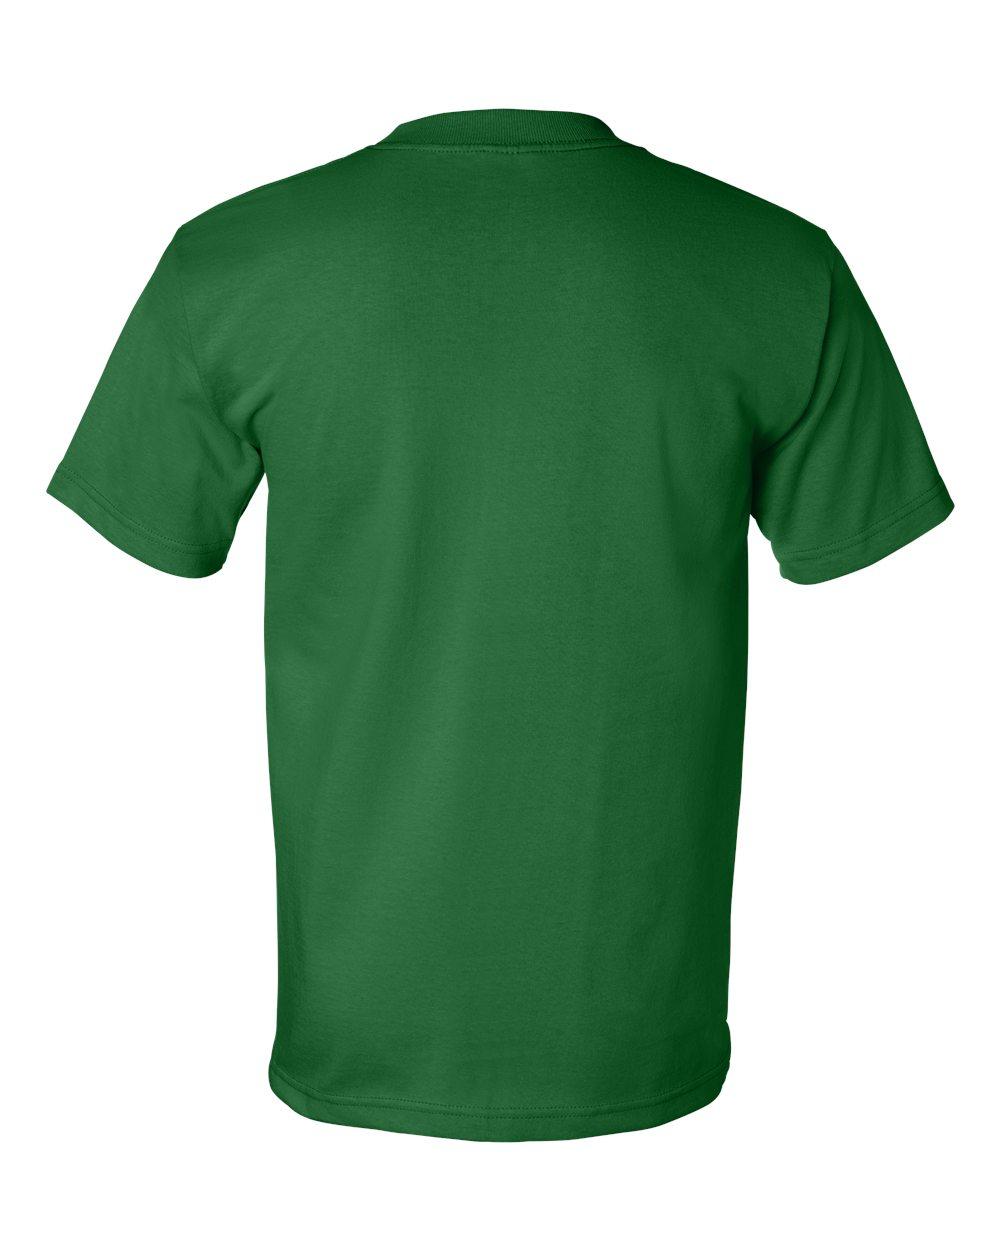 Bayside-Mens-Cotton-Blank-USA-Made-Short-Sleeve-T-Shirt-5100-up-to-5XL thumbnail 22